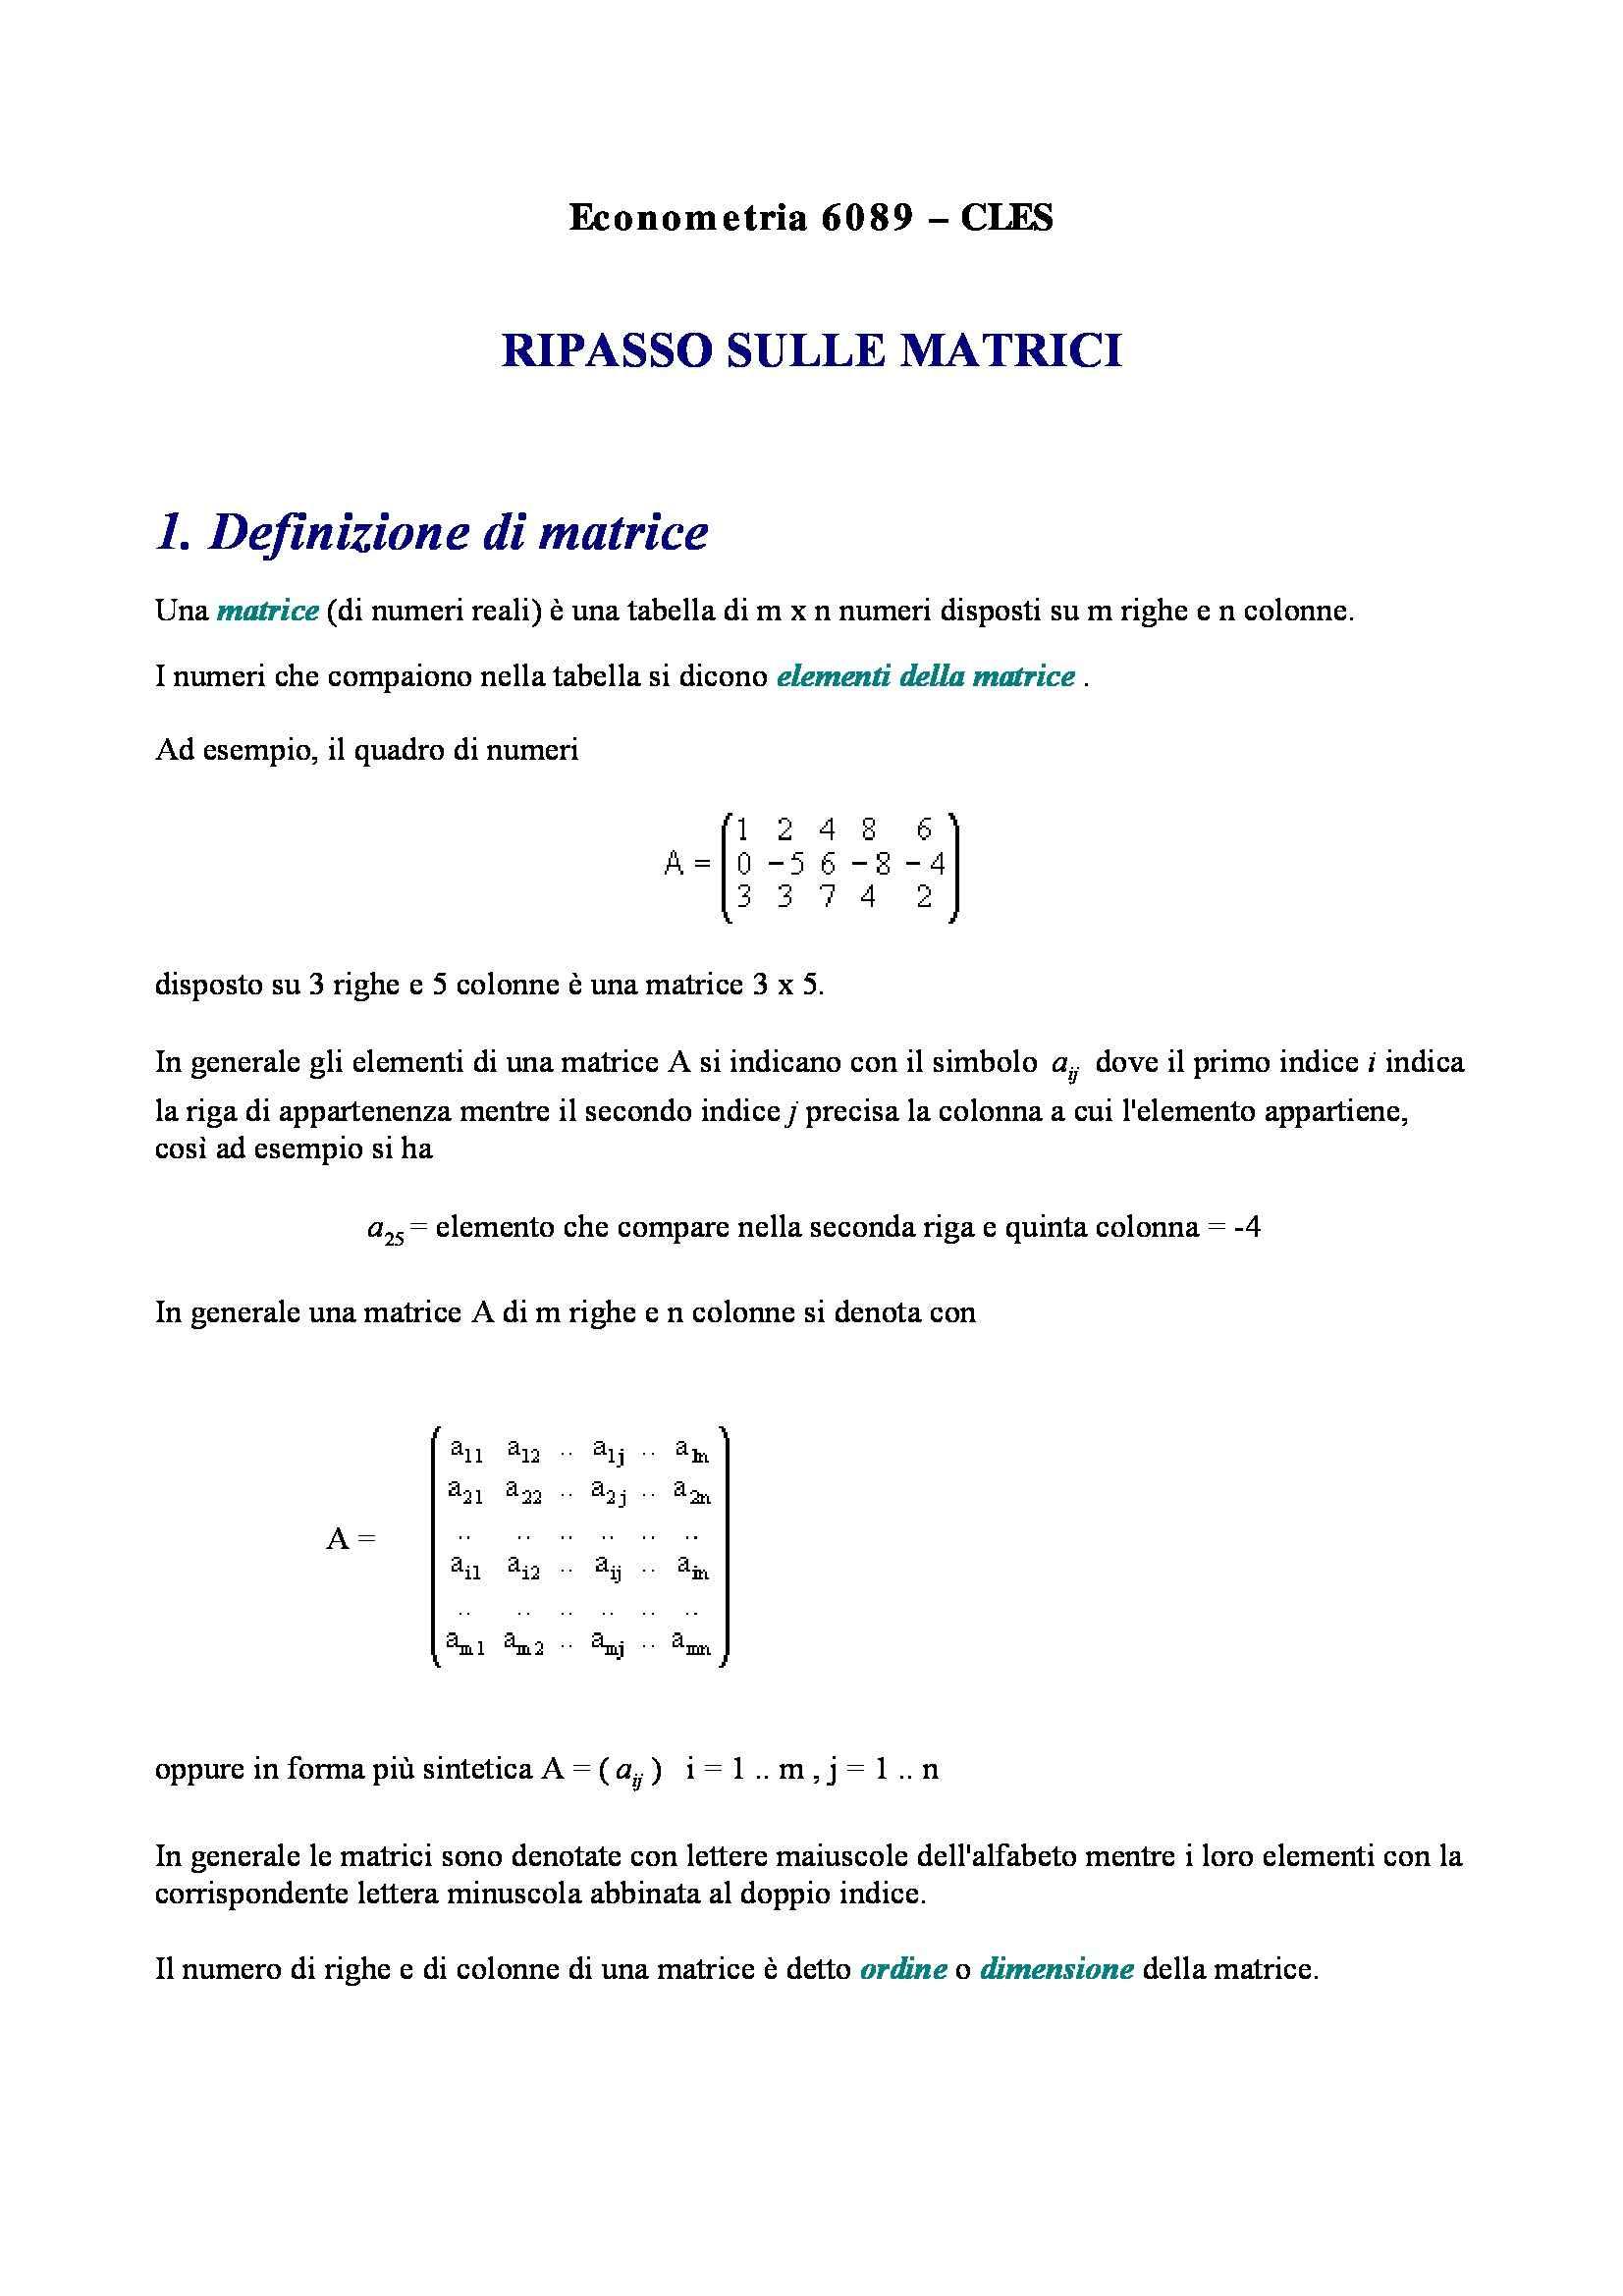 Econometria - le matrici